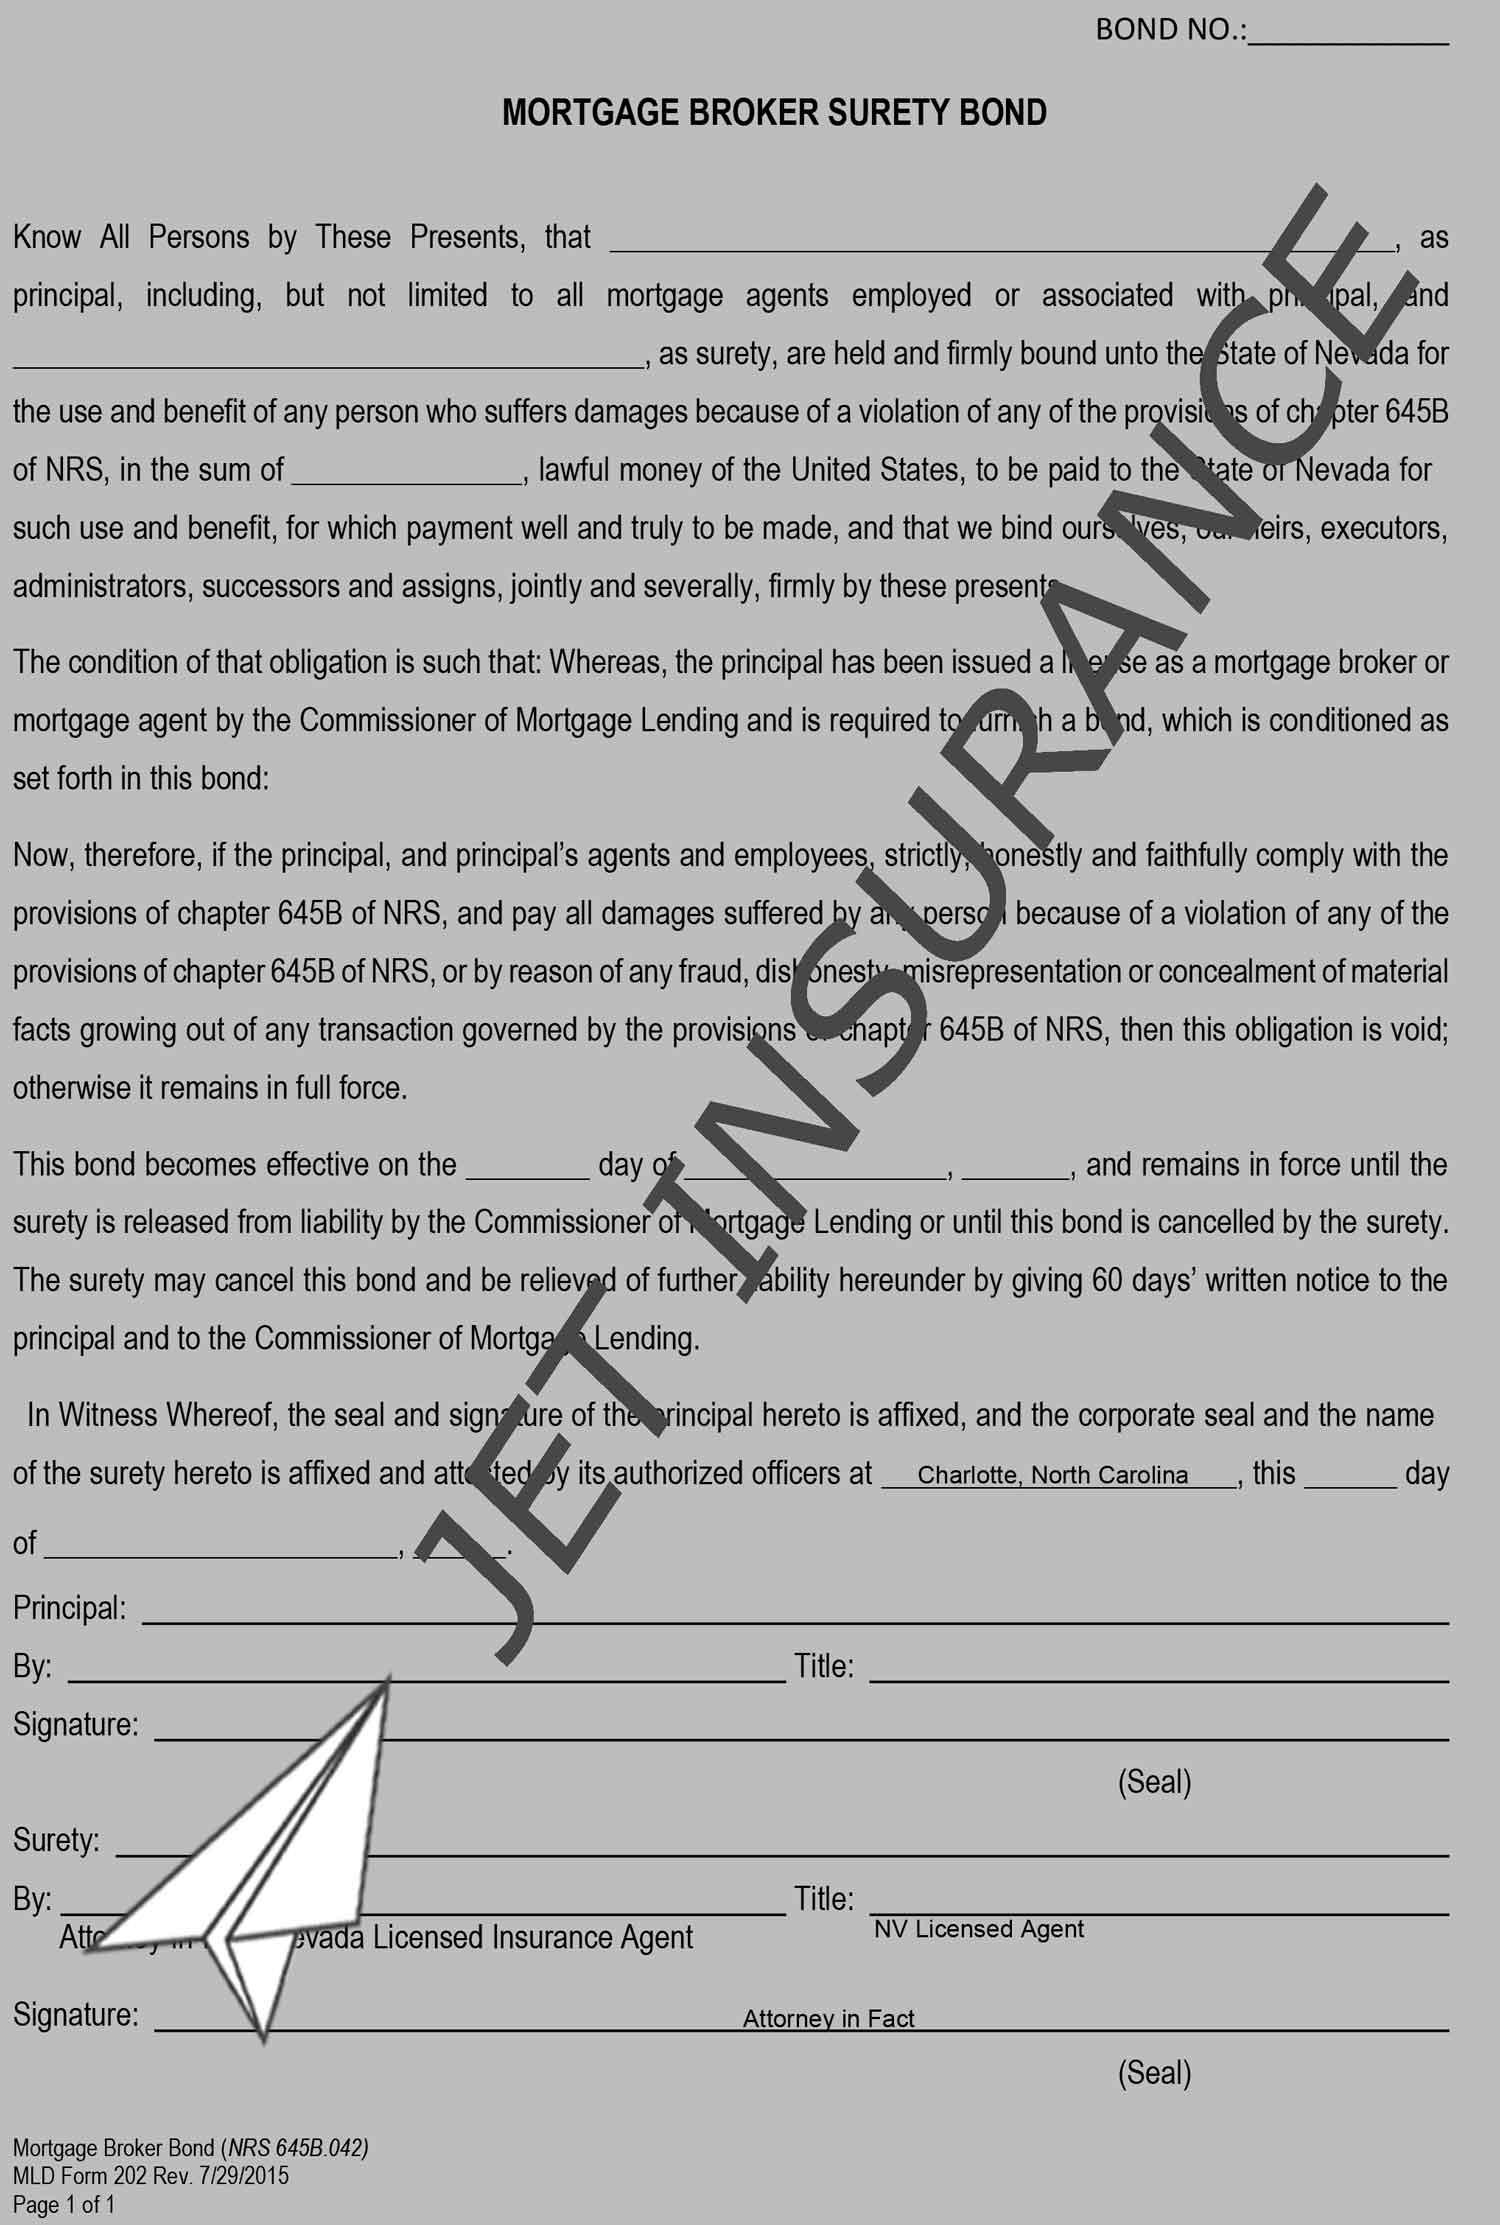 Nevada Mortgage Company License Bond Form